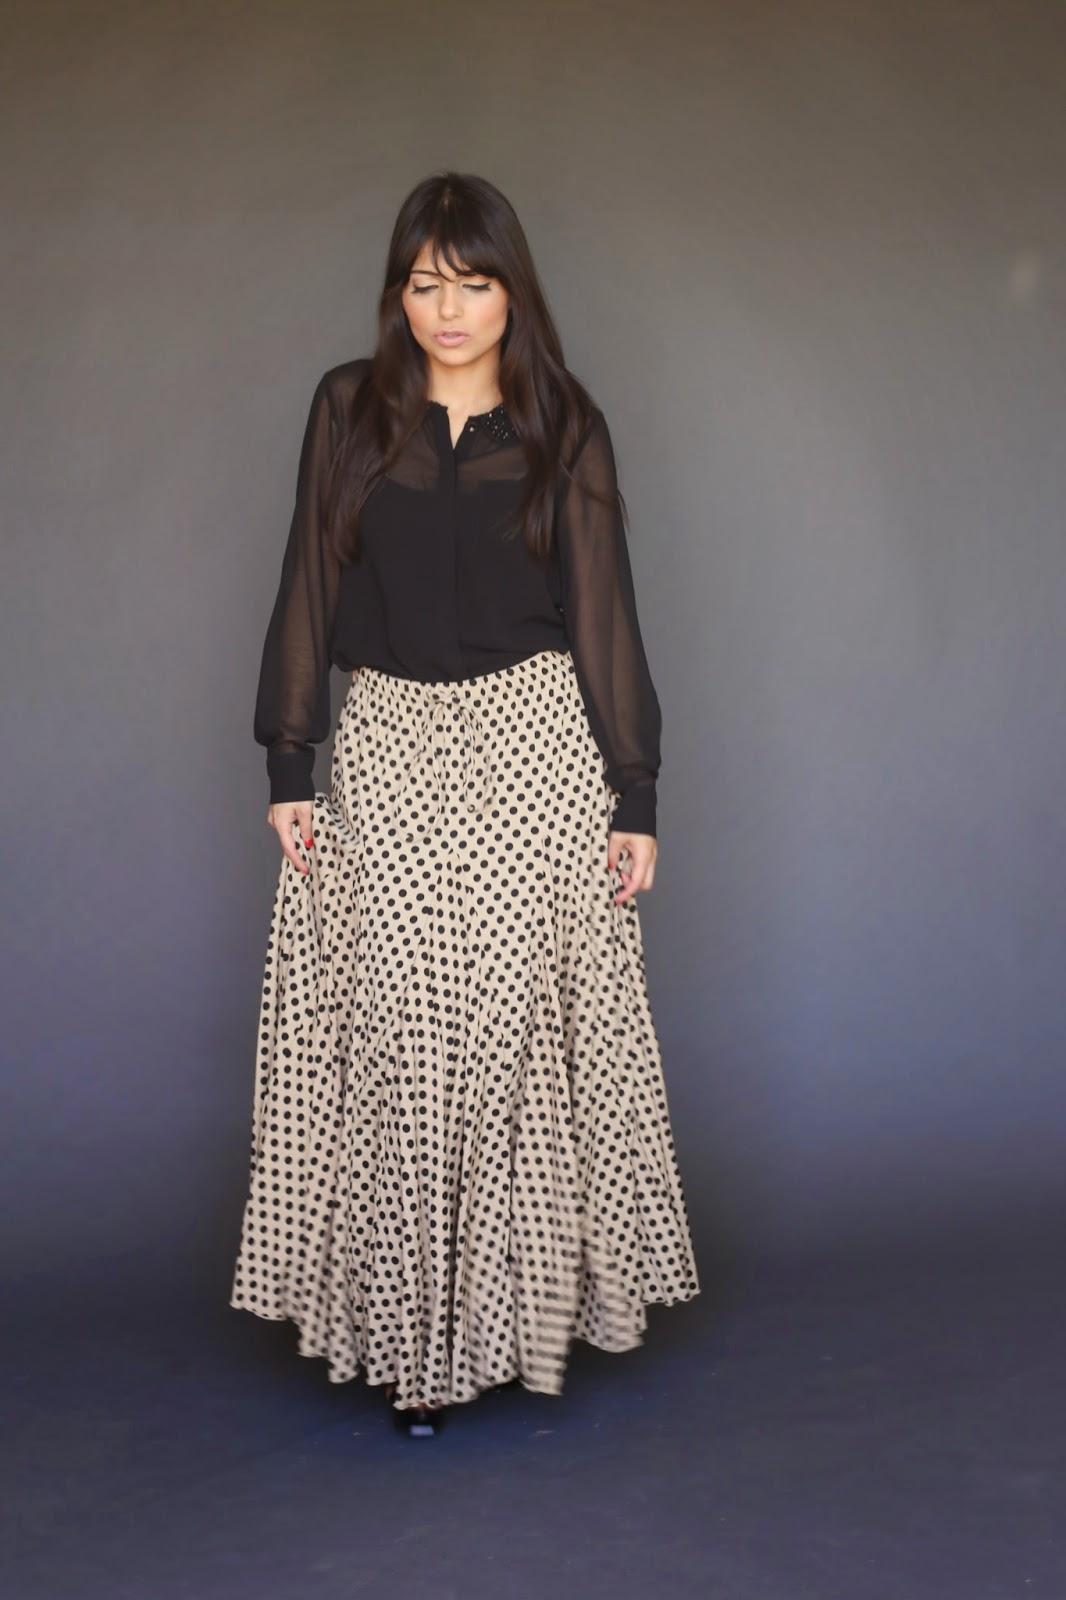 black polkadot modest maxi skirt on beige background no slits hijab tznius mormon lds fashion style Mode-sty